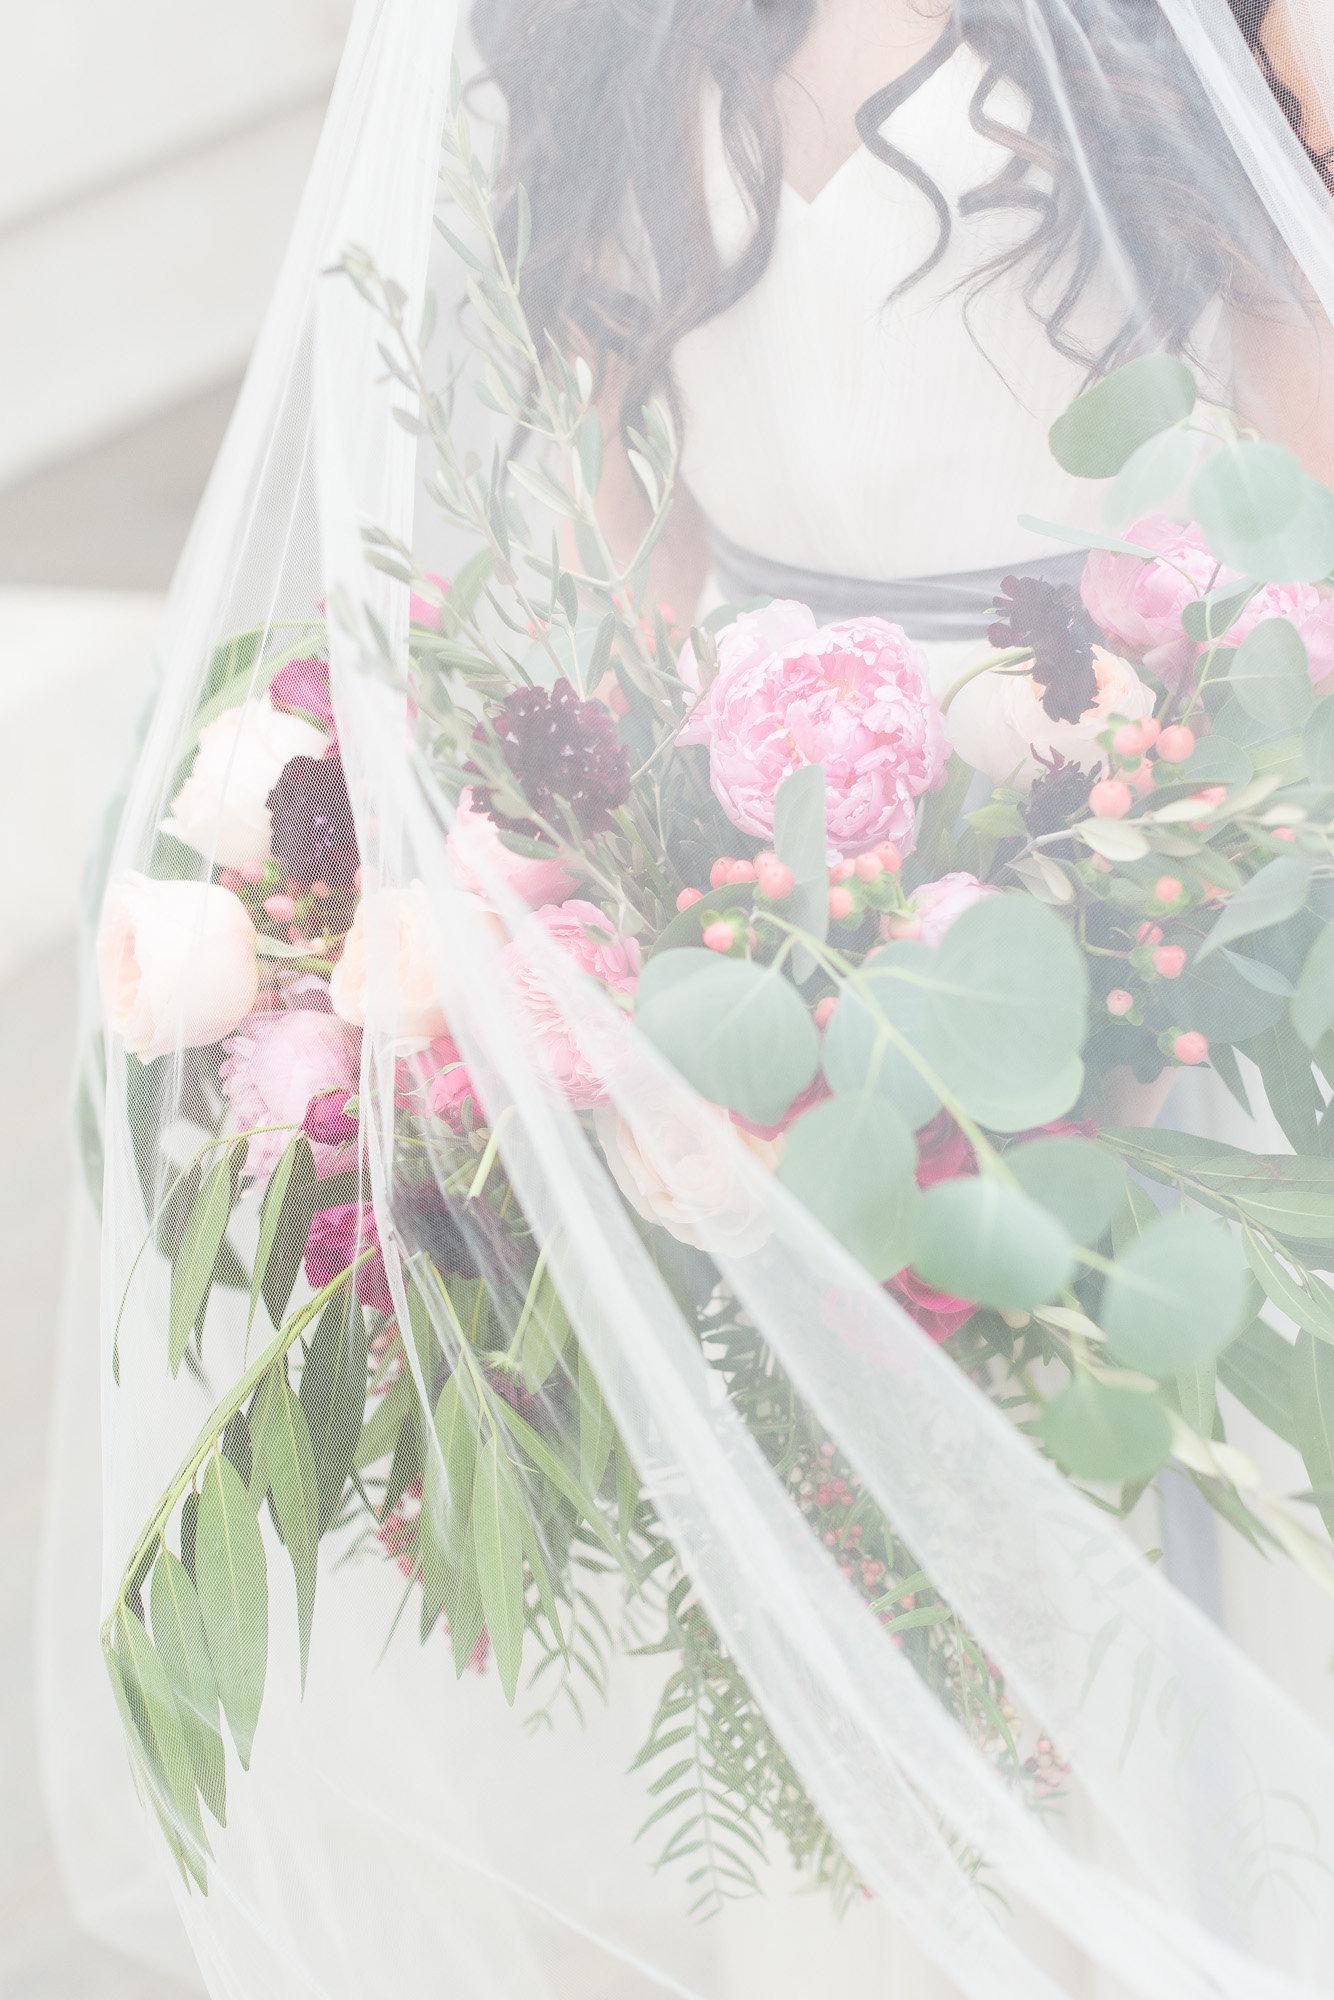 Colorful Santorini Inspired Styled Shoot Featured on Inspired by This!- Konsider It Done- AZ Arizona Wedding & Event Planner, Designer, Coordinator Planning in Scottsdale, Phoenix, Paradise Valley, Tempe, Gilbert, Mesa, Chandler, Tucson, Sedona